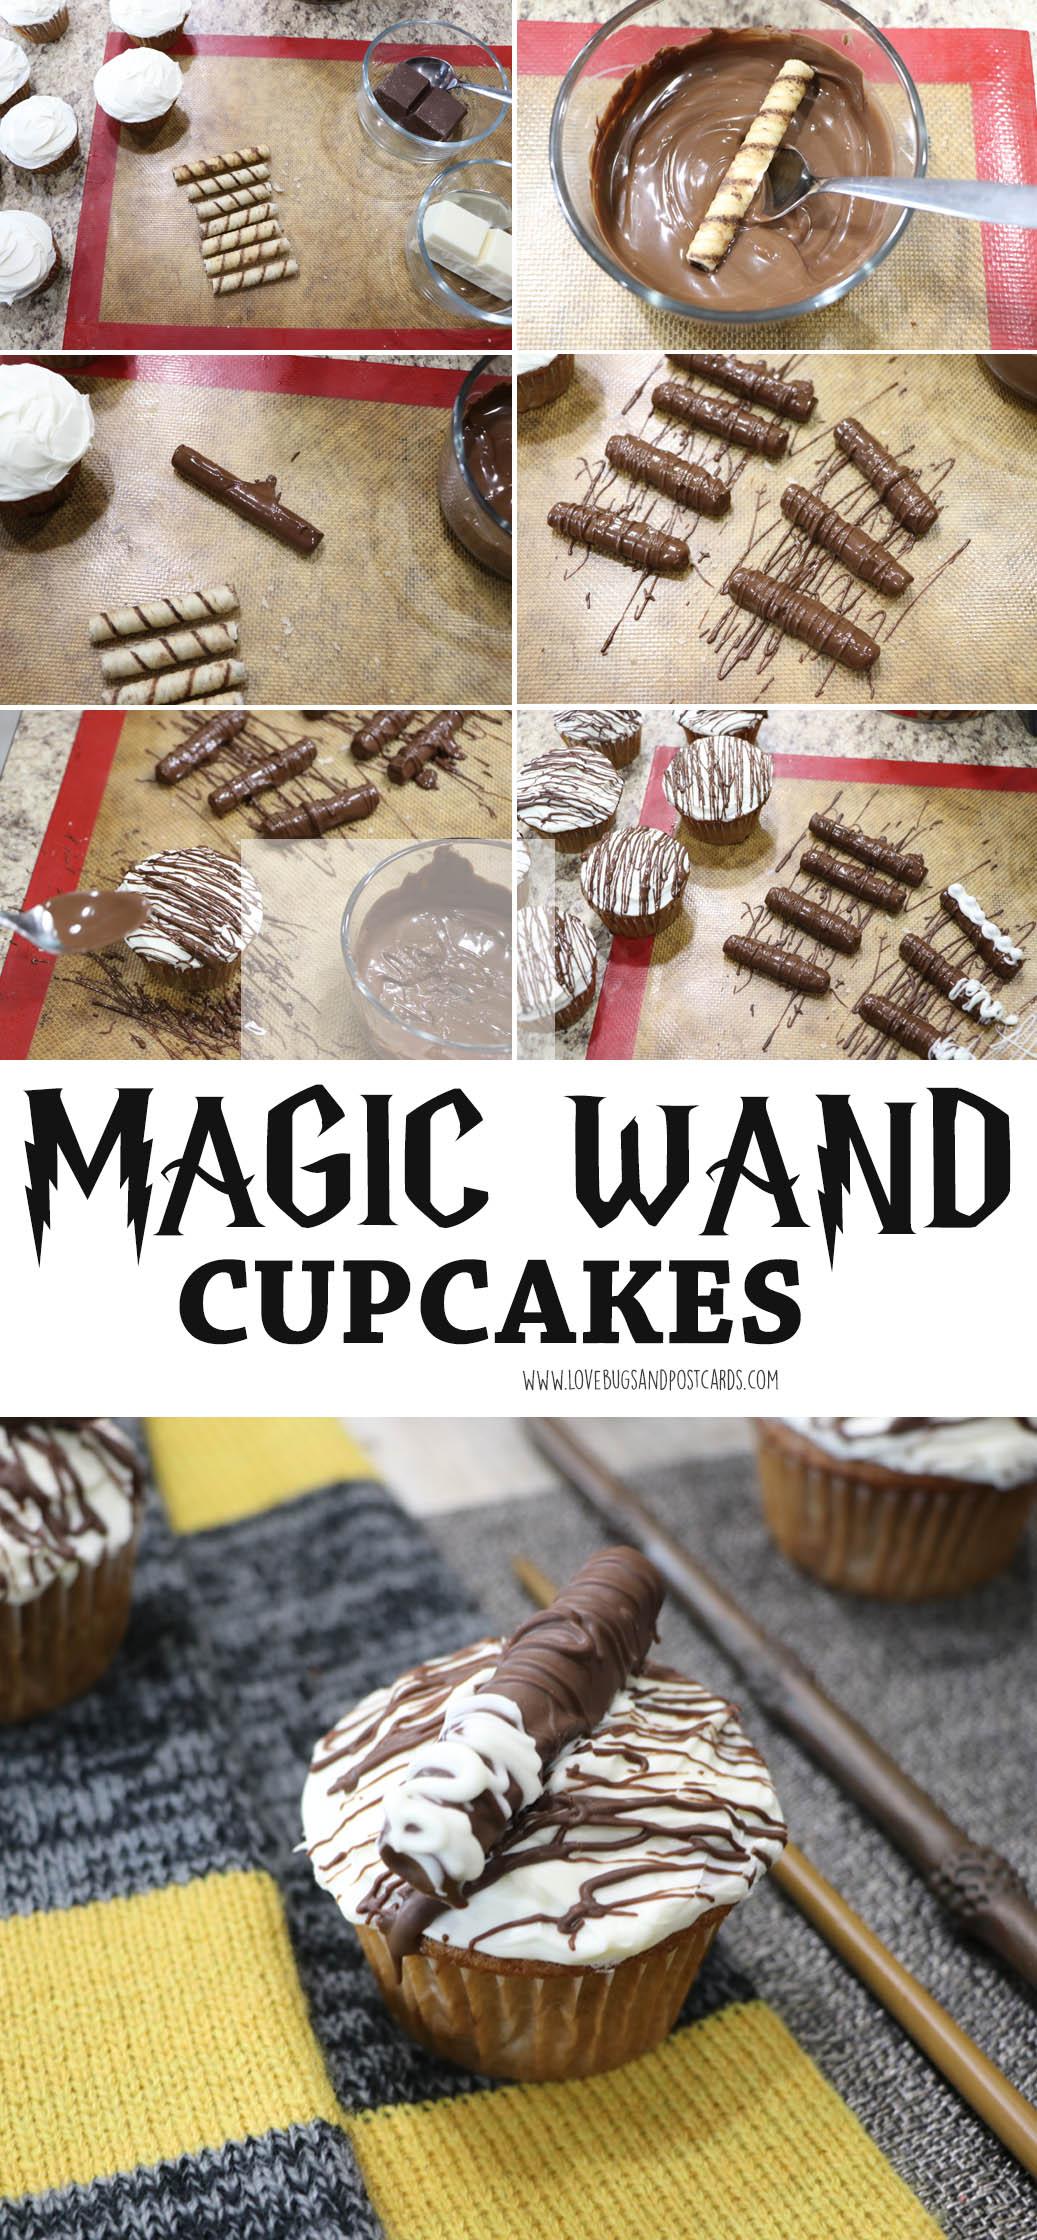 Magic Wand Cupcakes